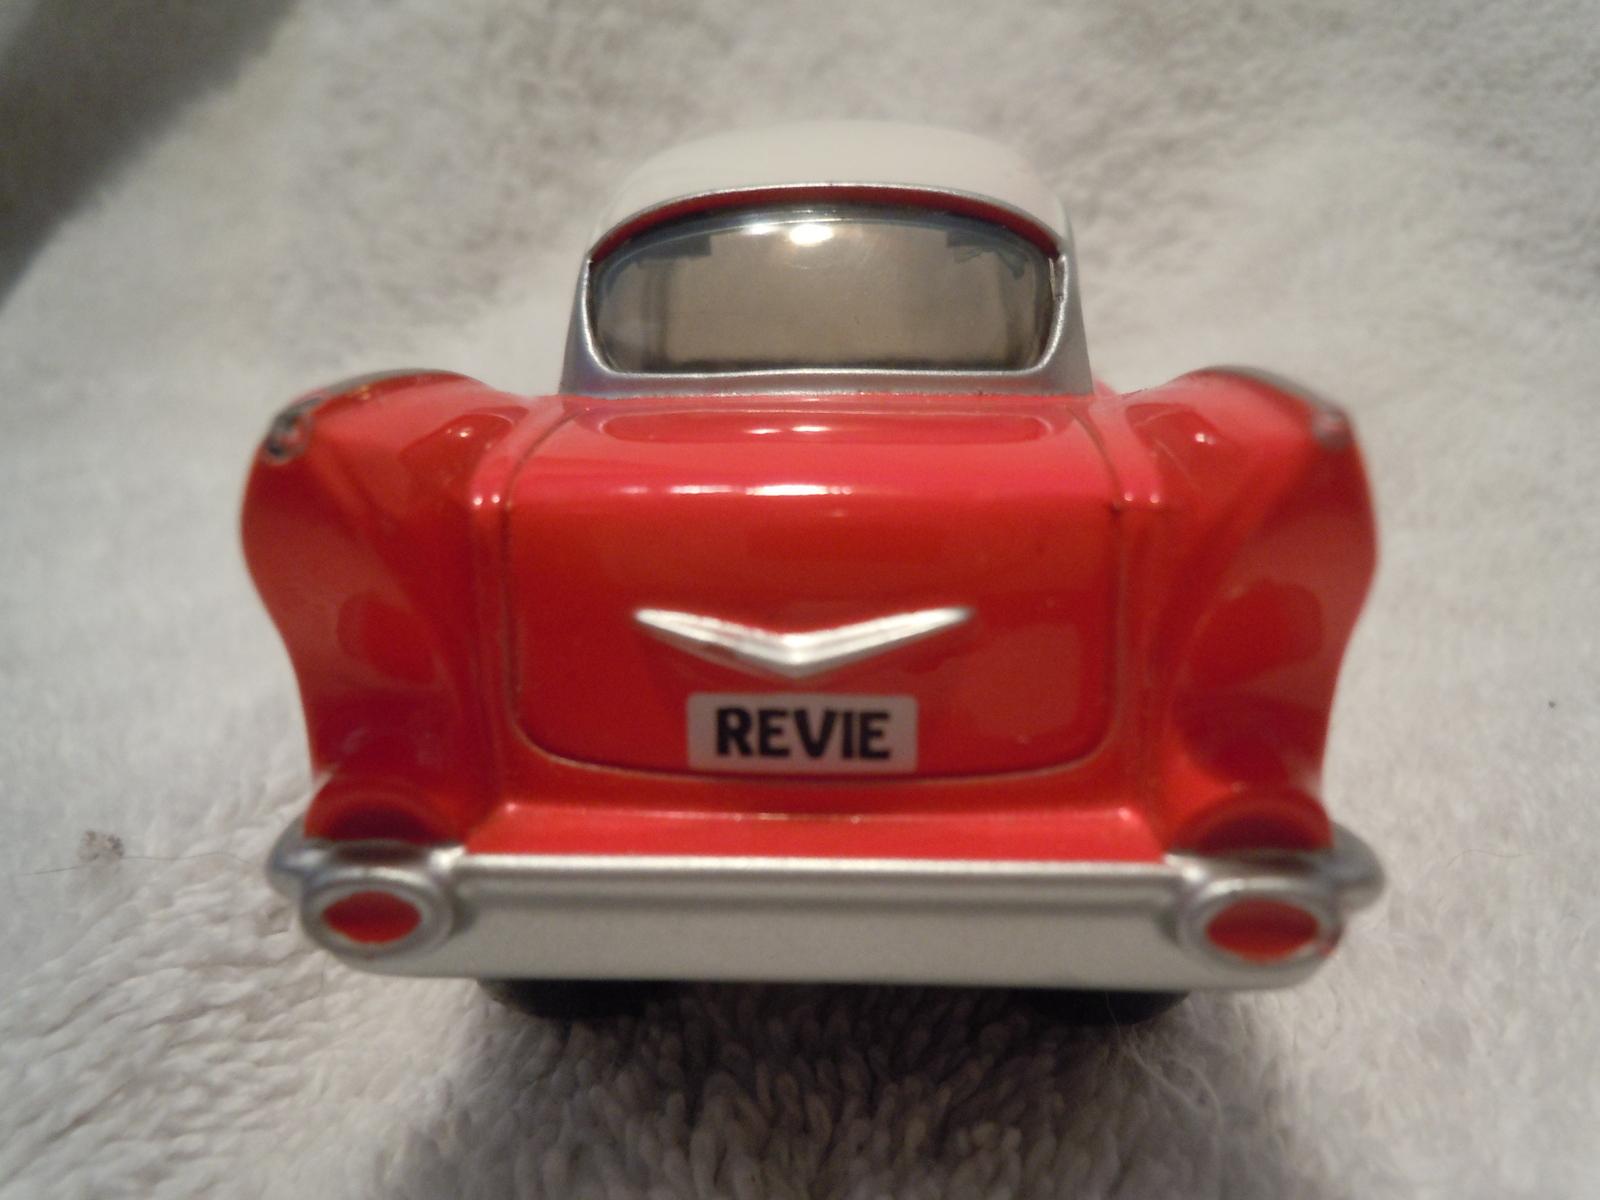 Revie Red Car Ertl 1831 SR